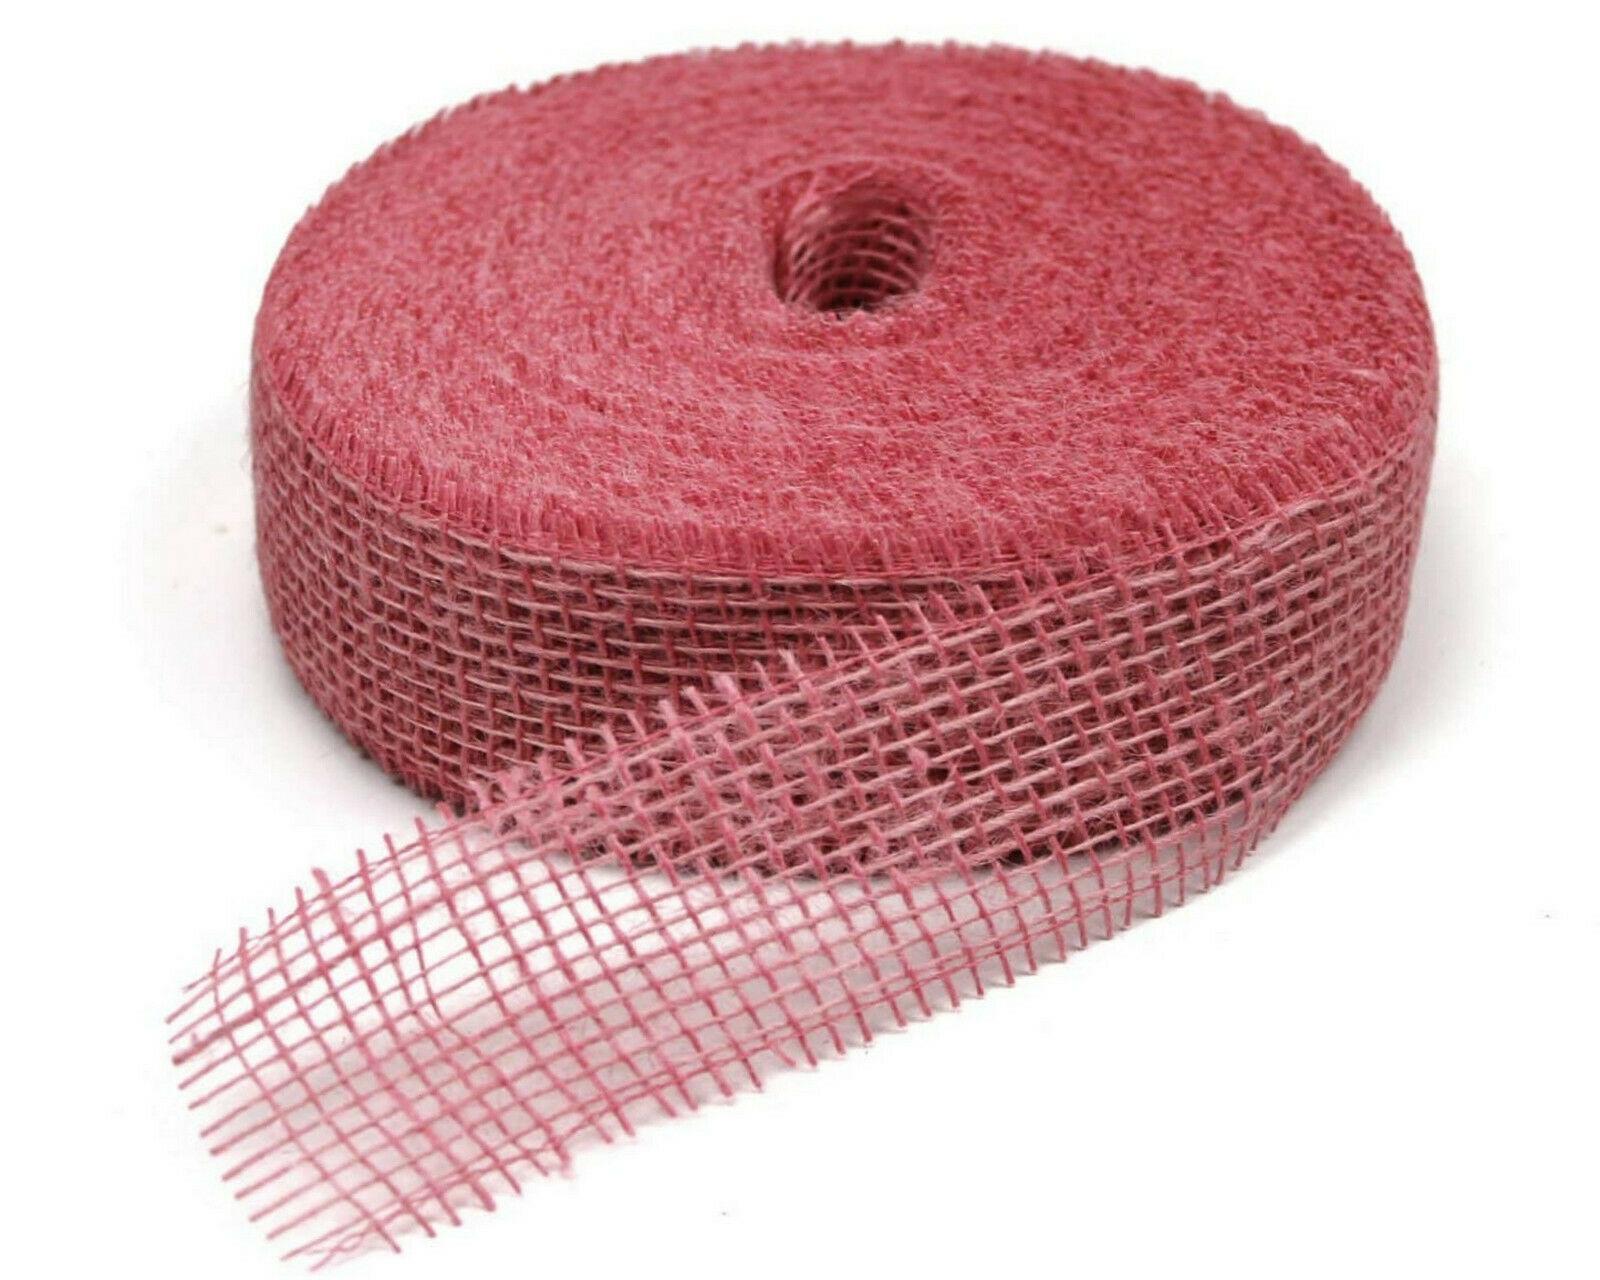 Juteband 40 m x 5 cm Dekoband ab 0,20 €/m Jute Rolle Schleifenband Rupfen Band - rosa (hart) 40 m